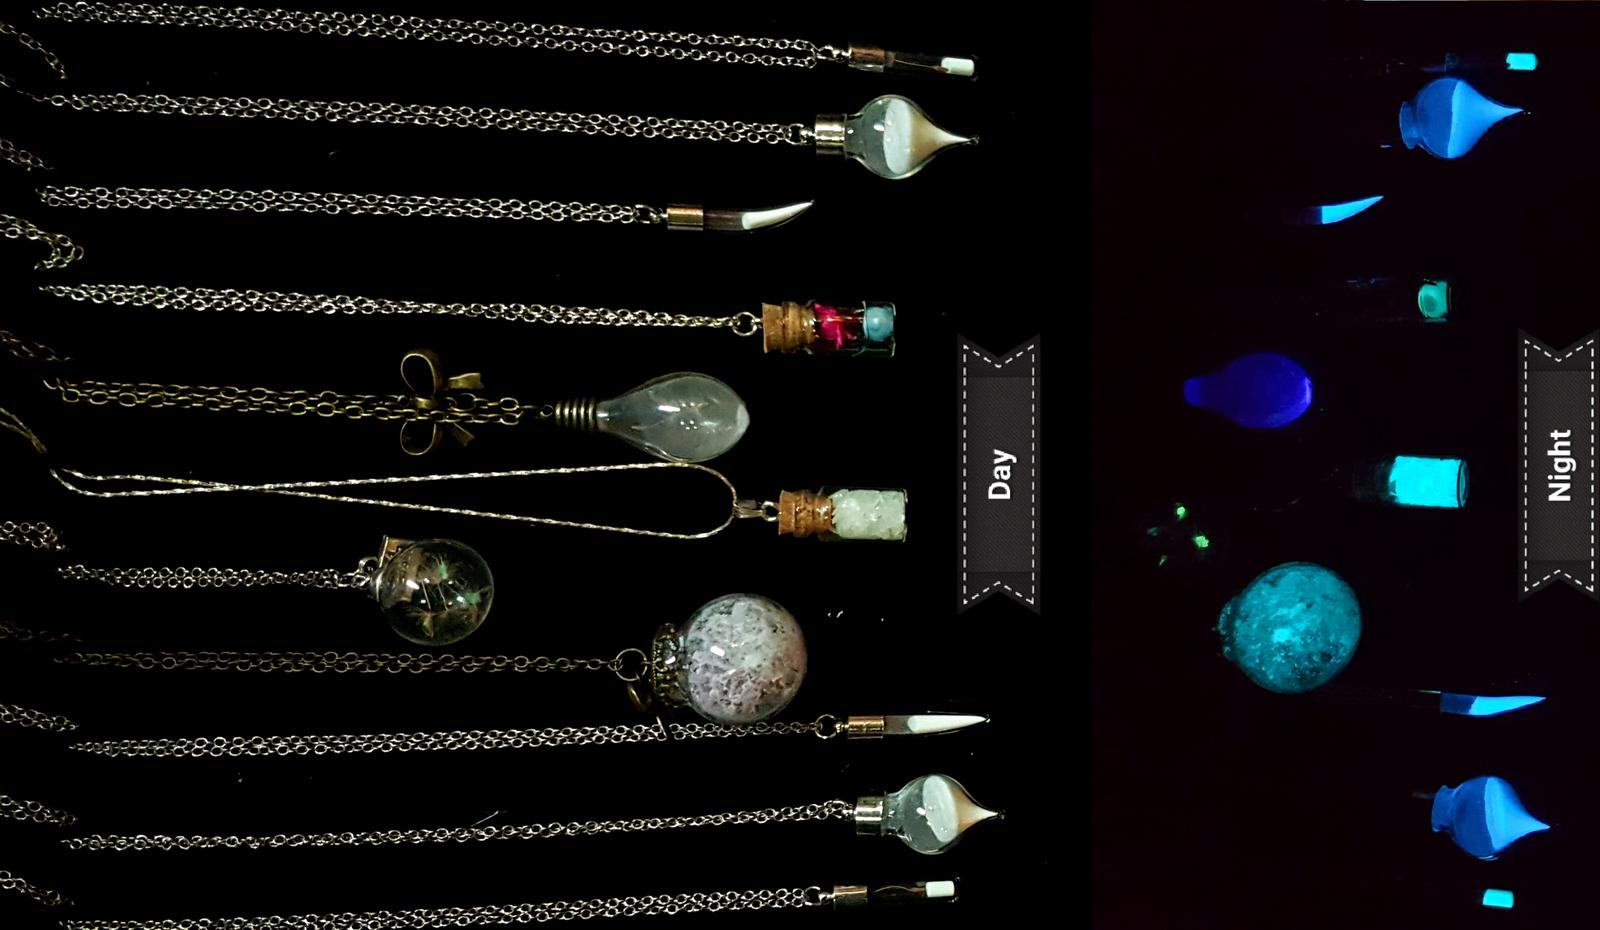 Glow in the Dark Jewellery